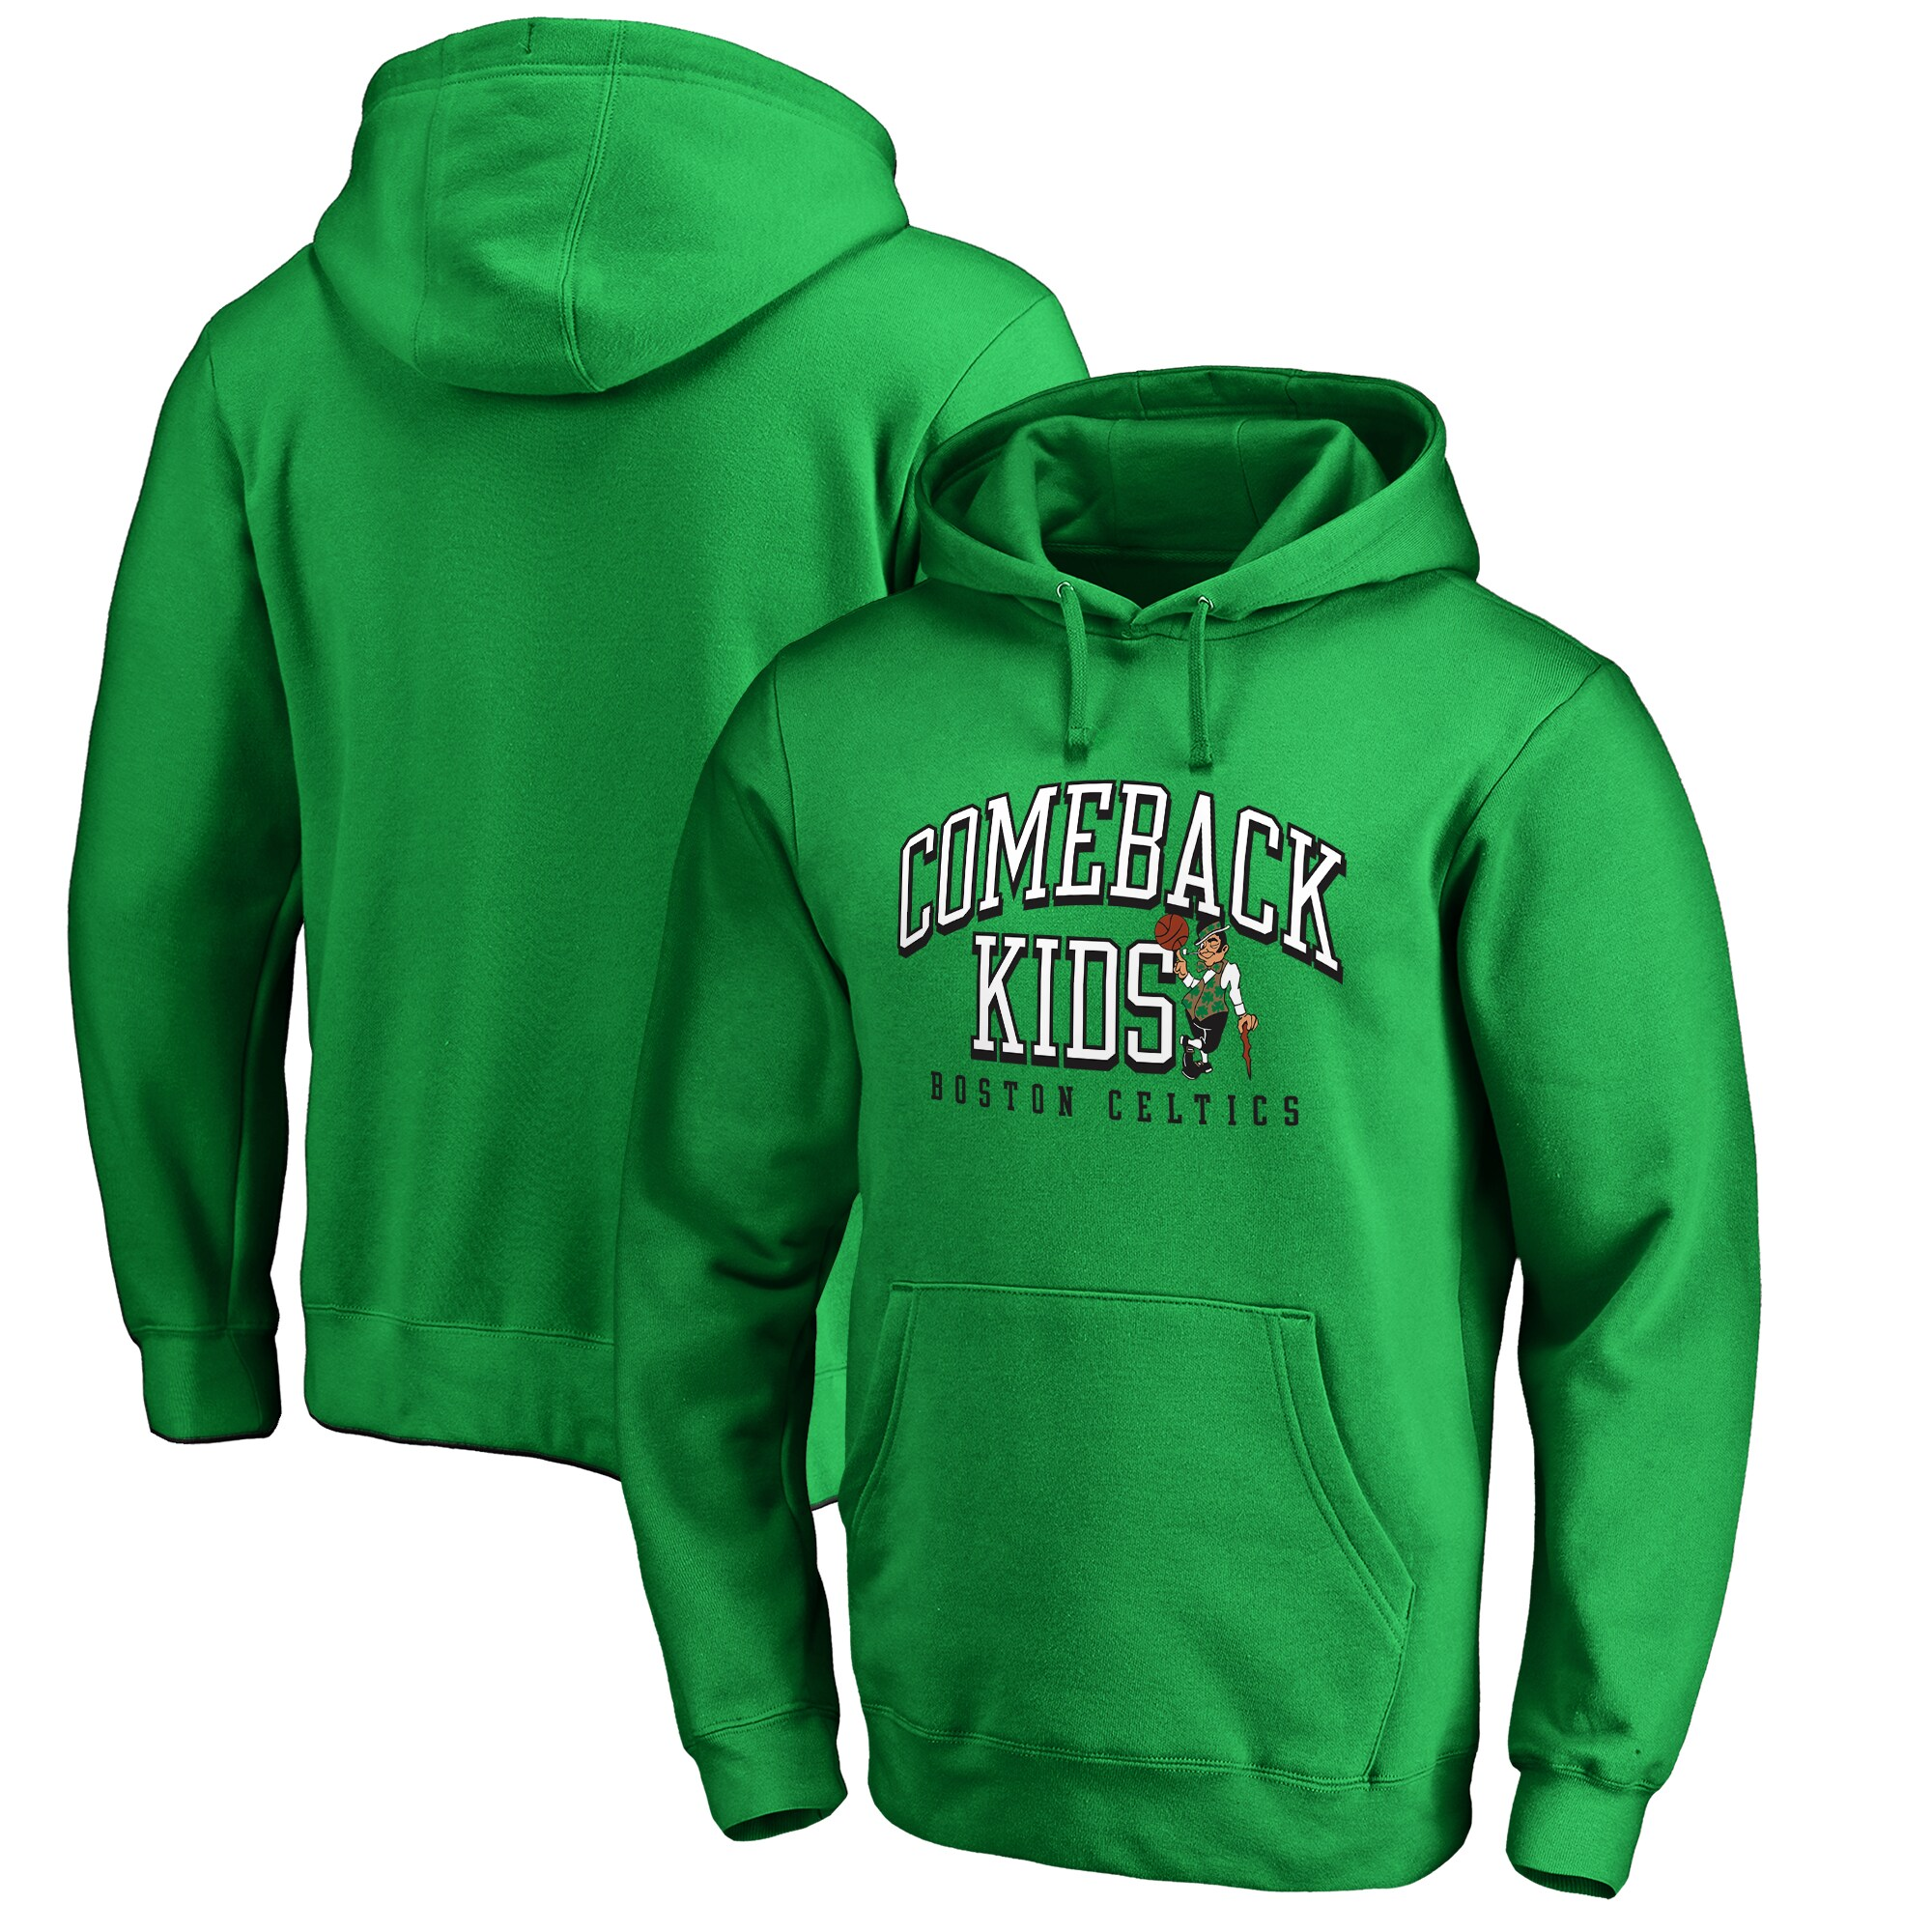 Boston Celtics Fanatics Branded Comeback Kids Pullover Hoodie - Kelly Green